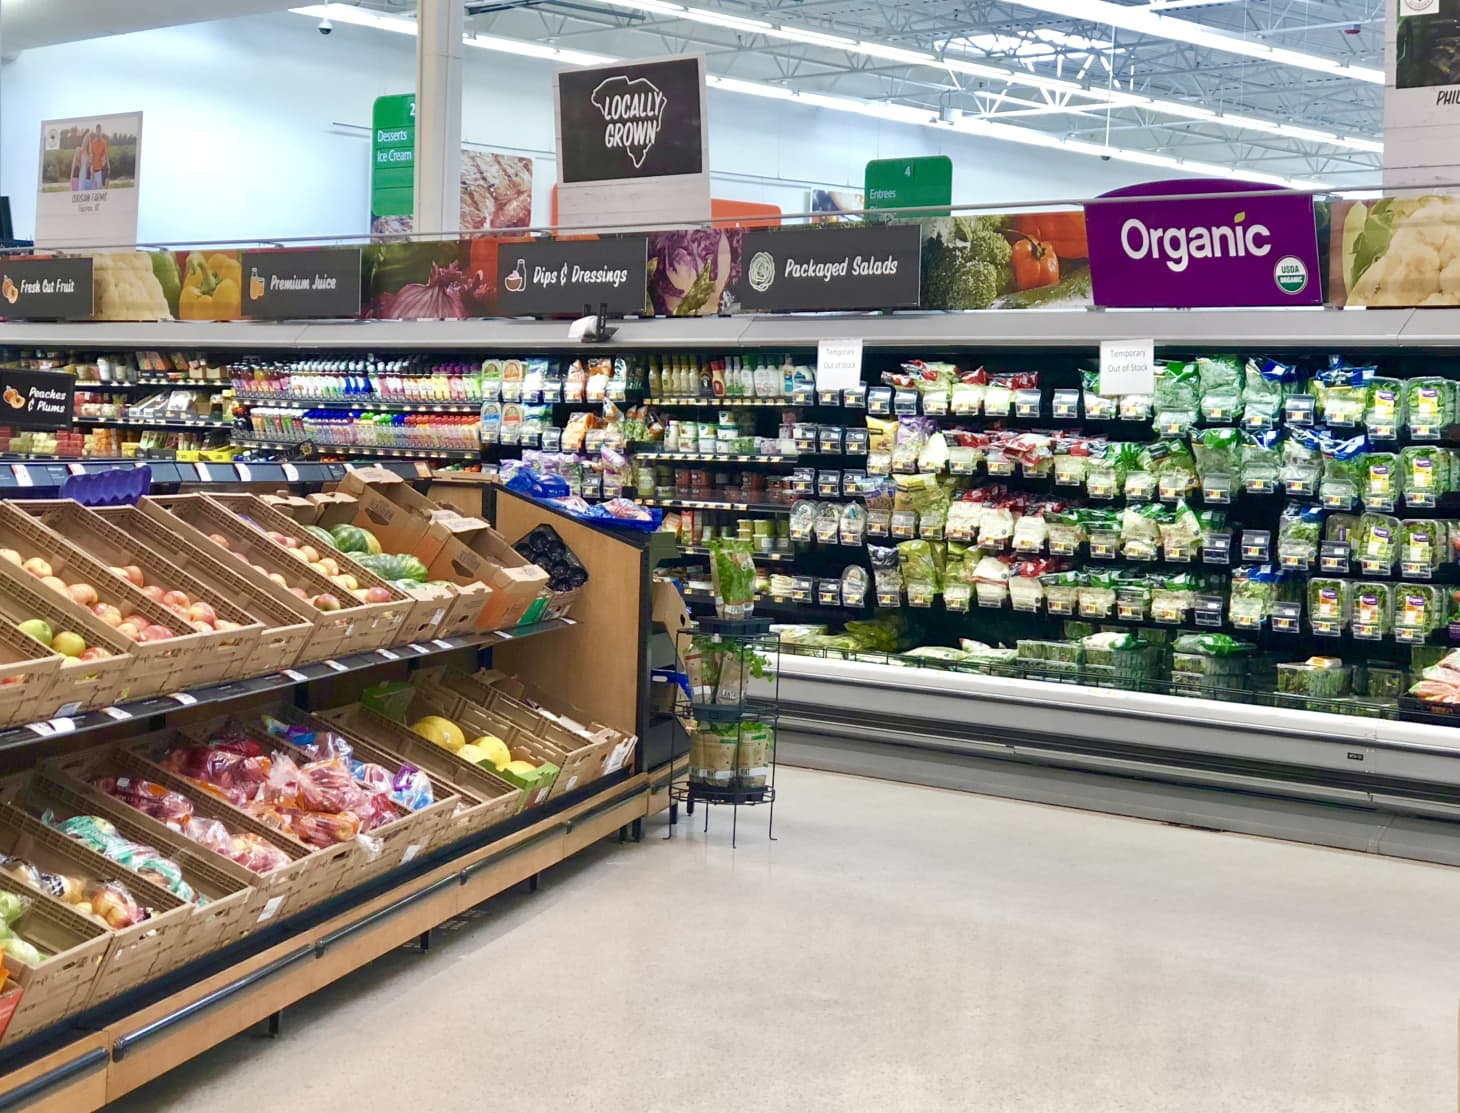 Best Cheap Fruits Vegetables - Aldi Walmart Lidl | Kitchn